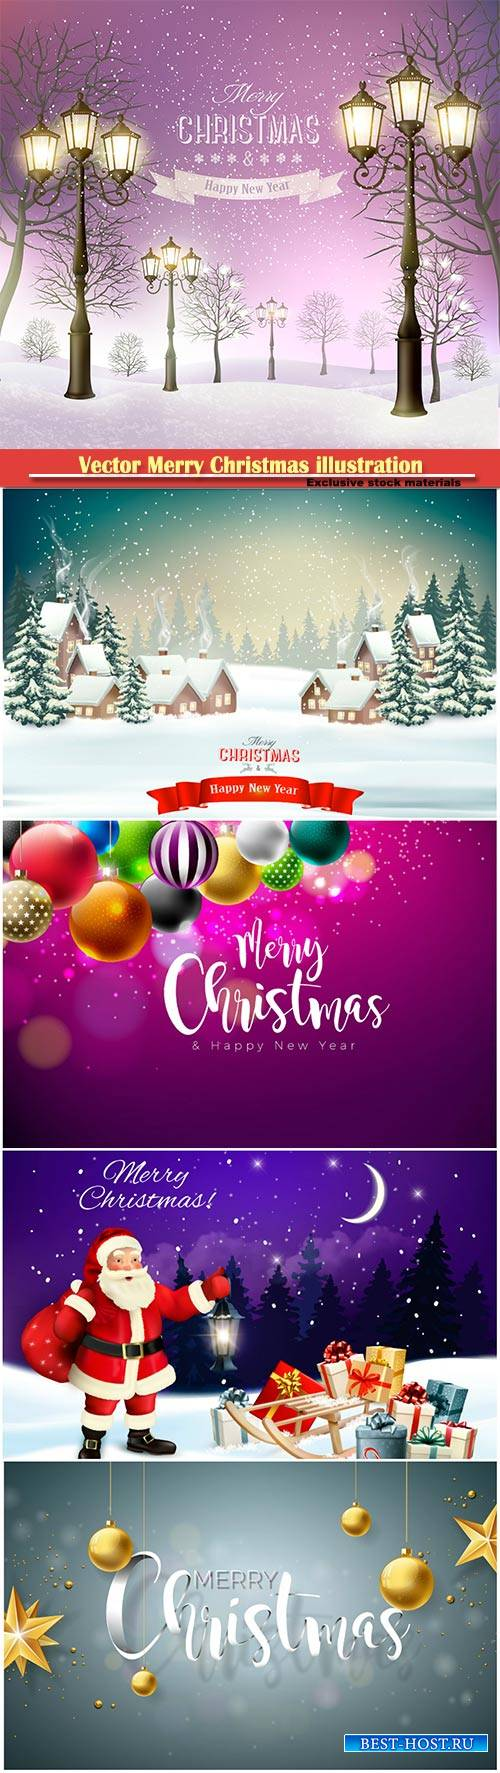 Vector Merry Christmas illustration, Happy New Year design